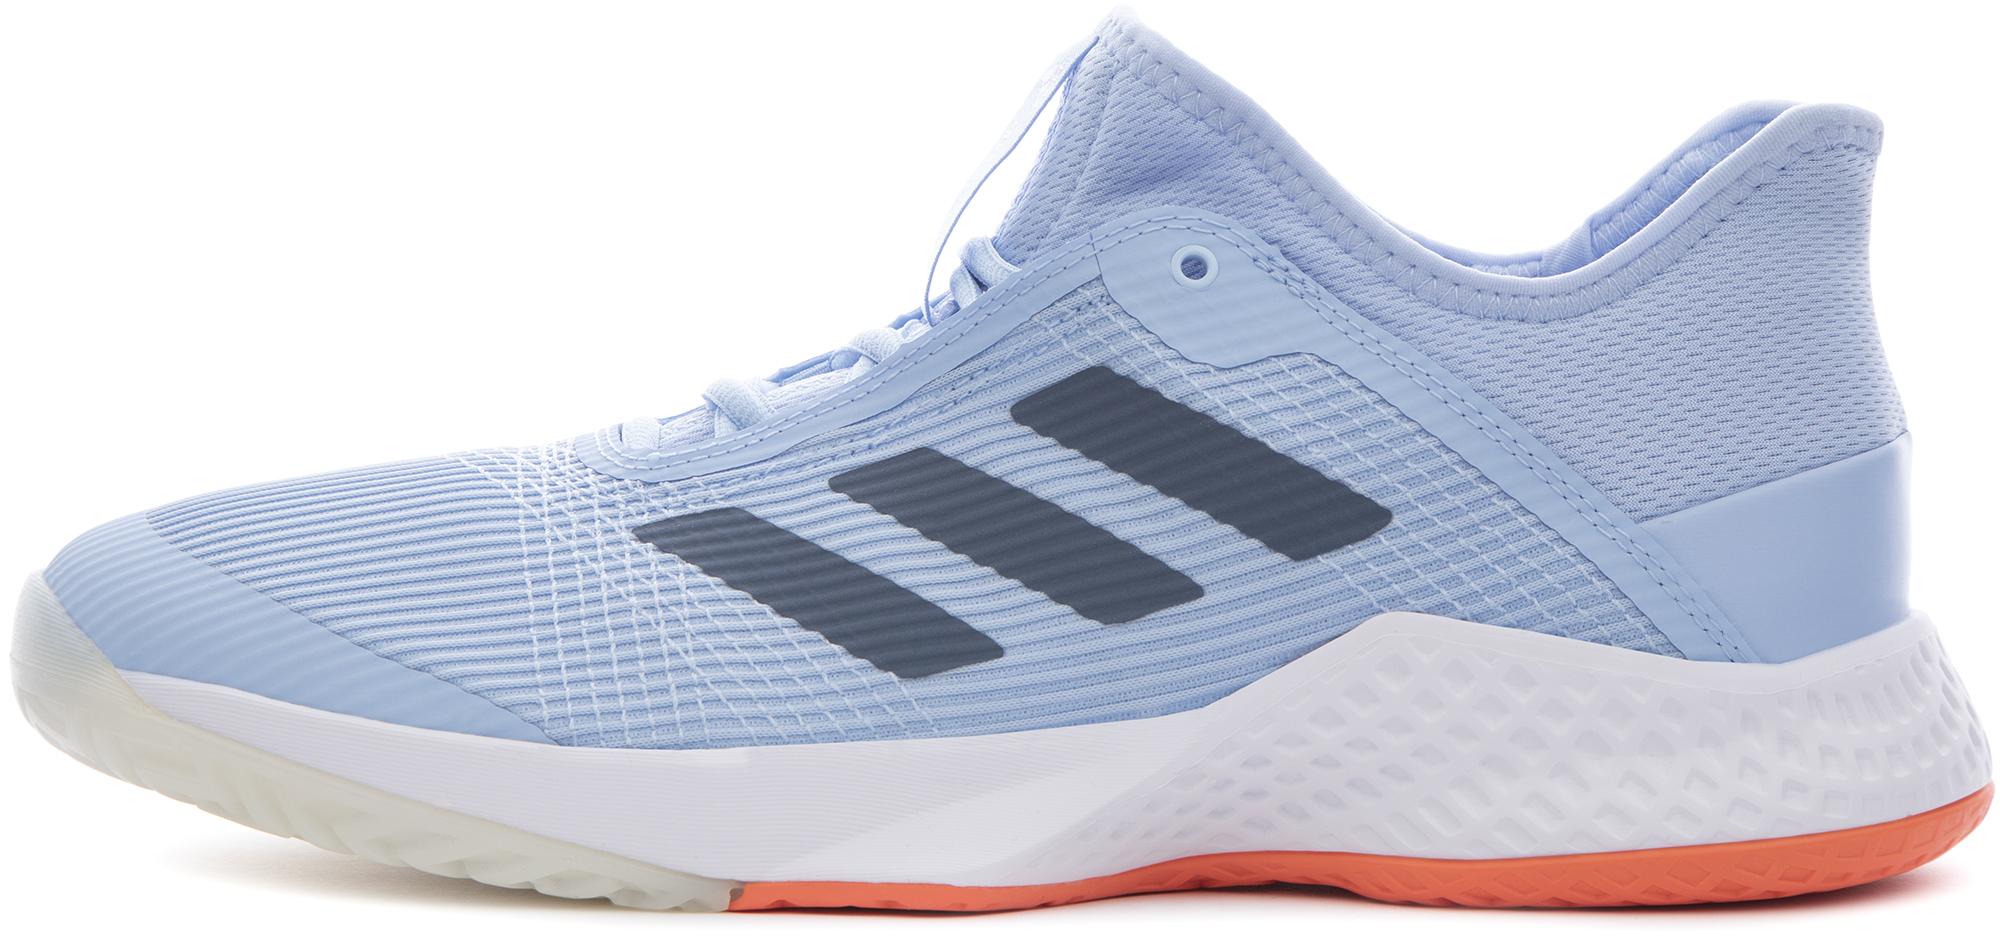 Adidas Кроссовки женские Adidas Adizero Club, размер 43